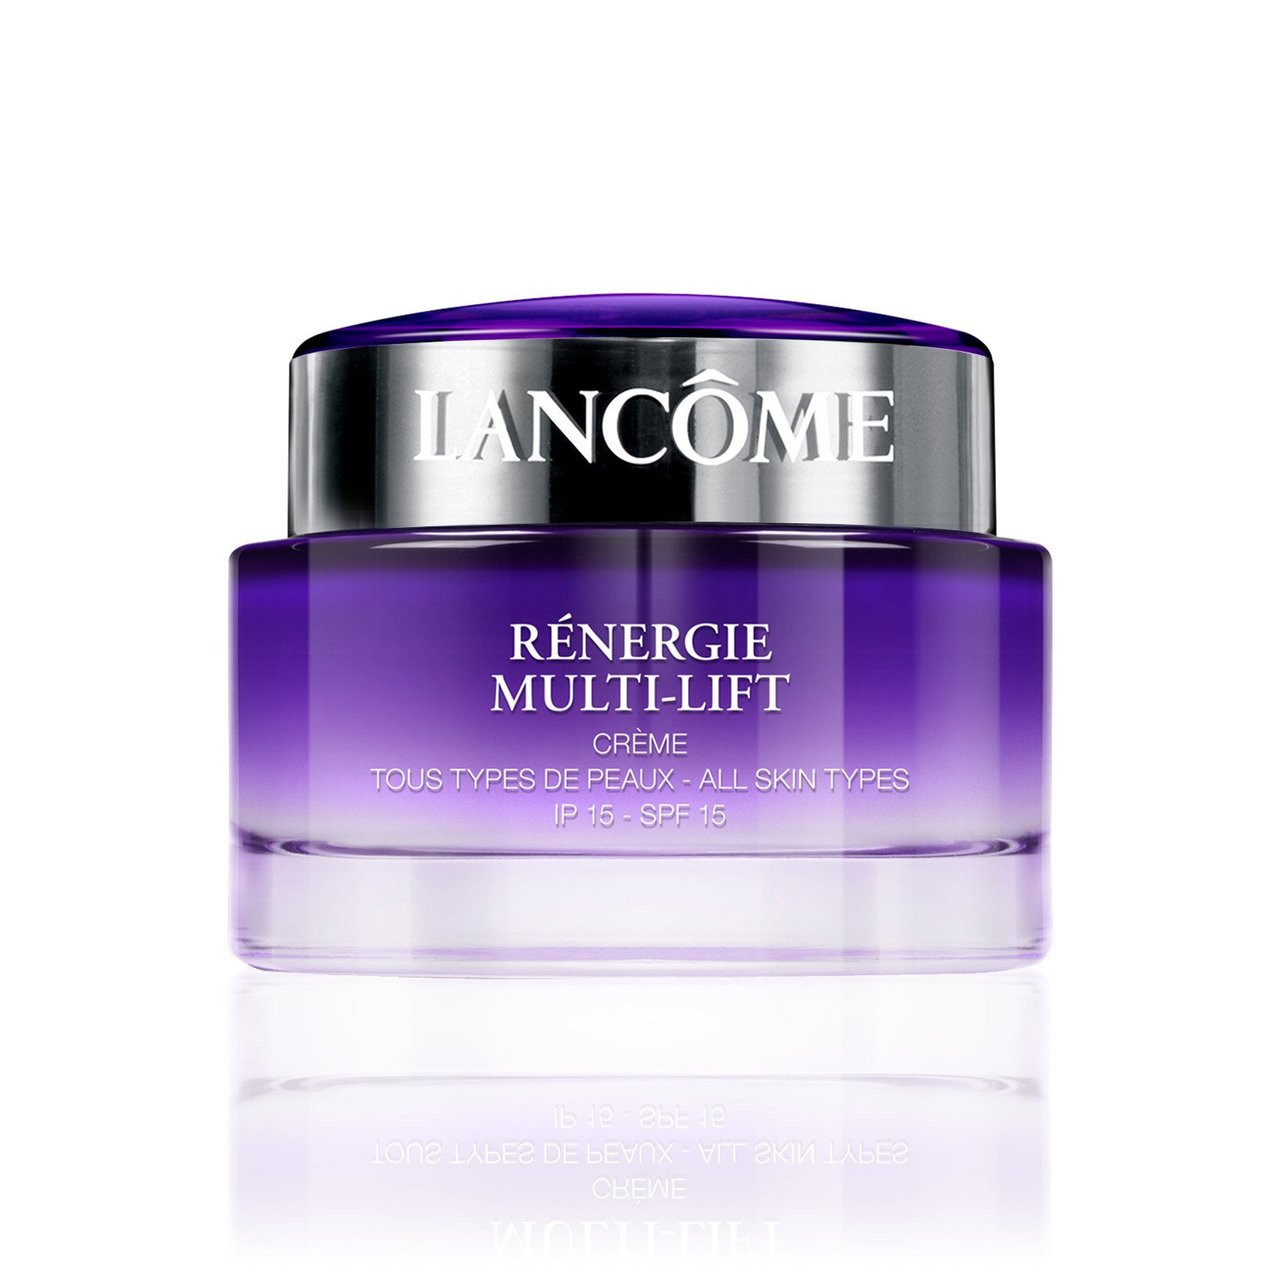 Renergie Multi-Lift Redefining Lifting Cream SPF15 by Lancôme #5